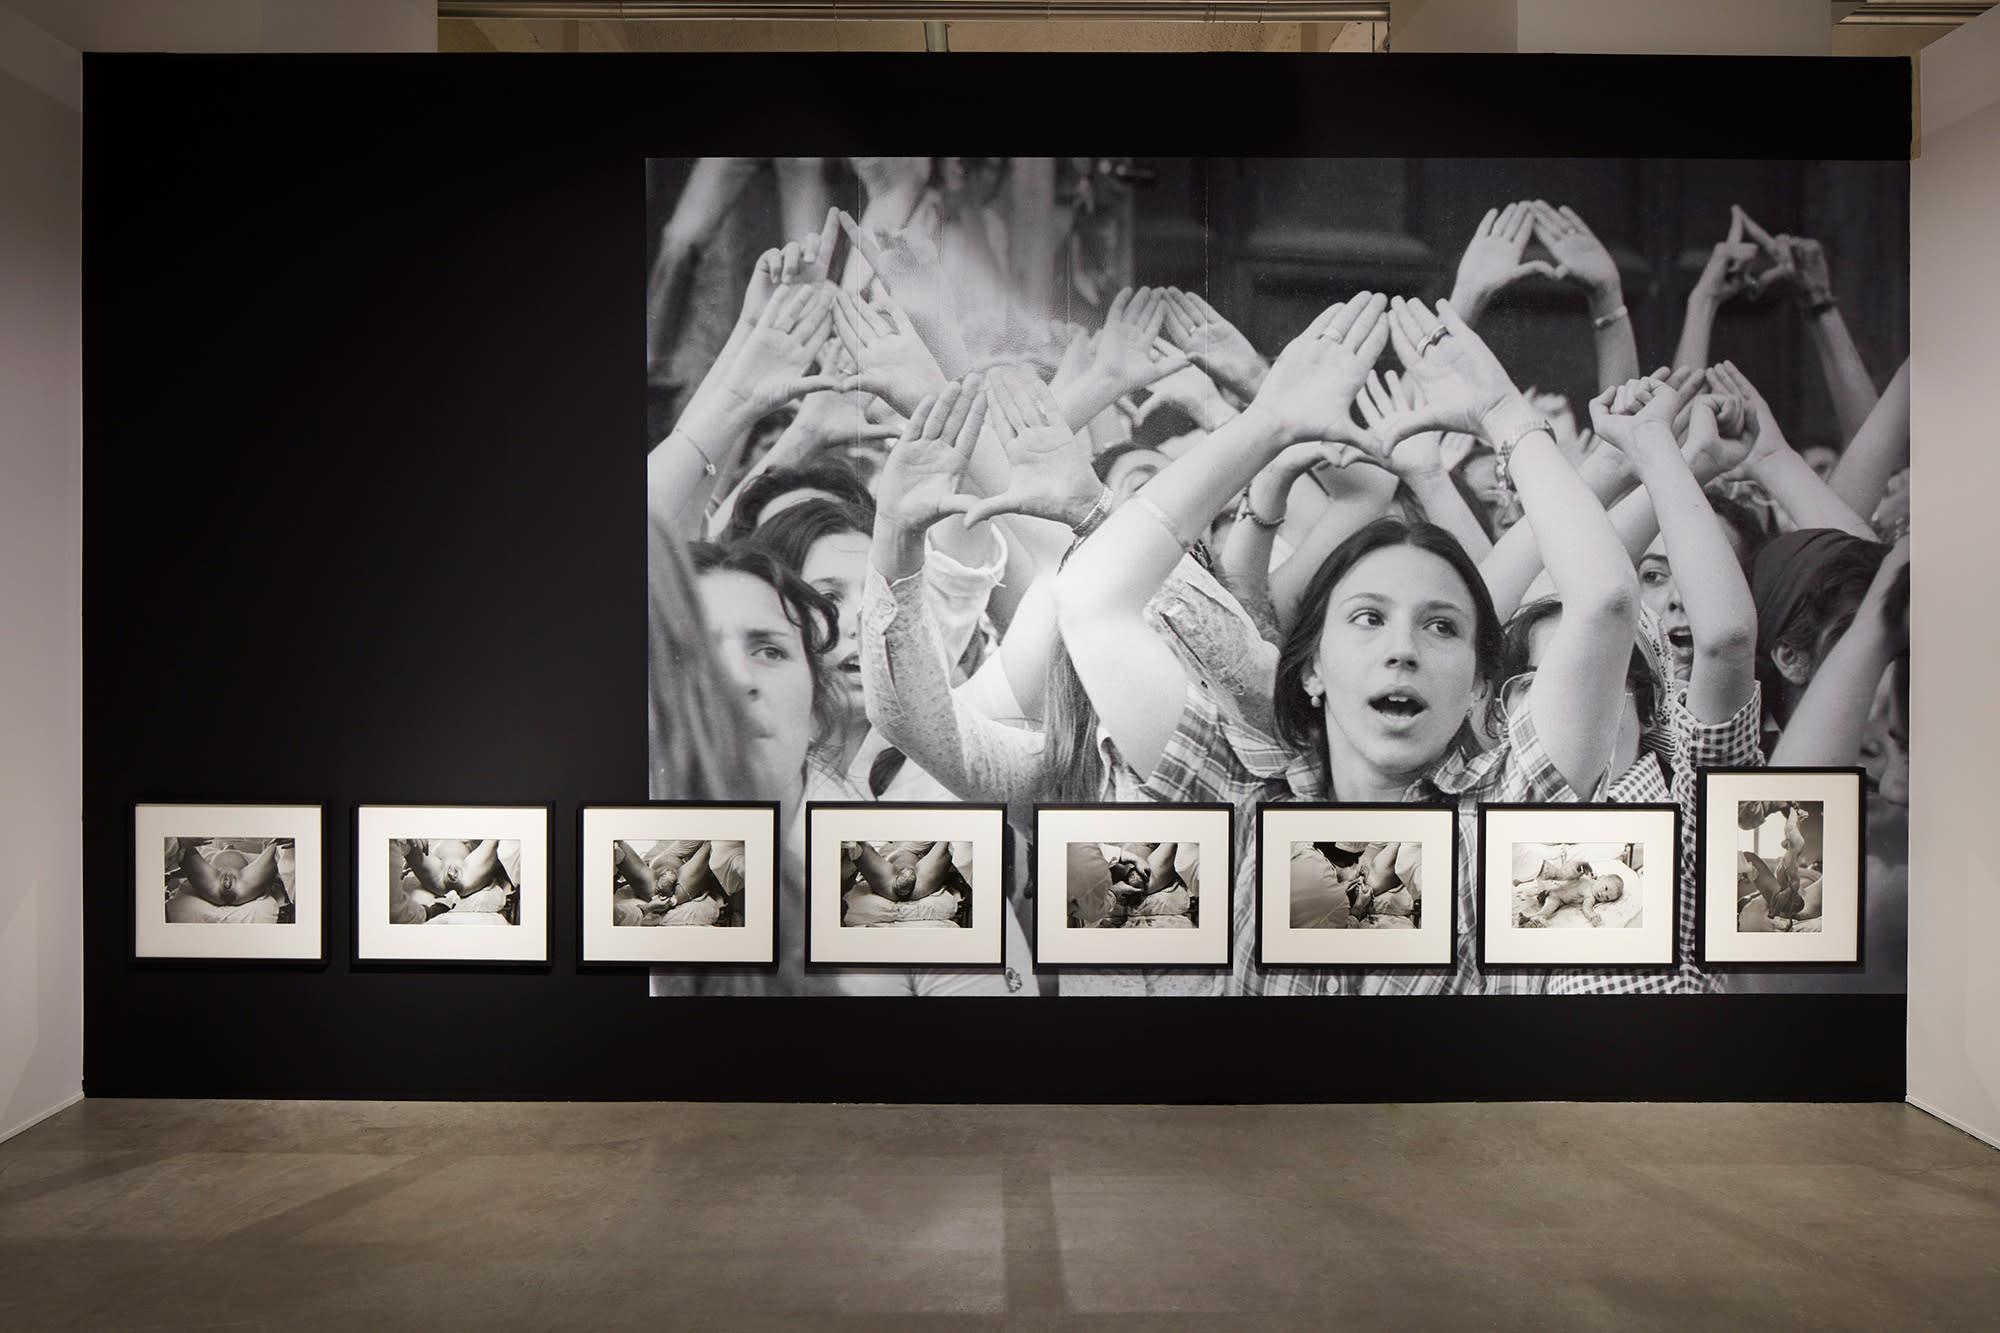 Flash Art | Frigoriferi Milanesi | The unexpected subject